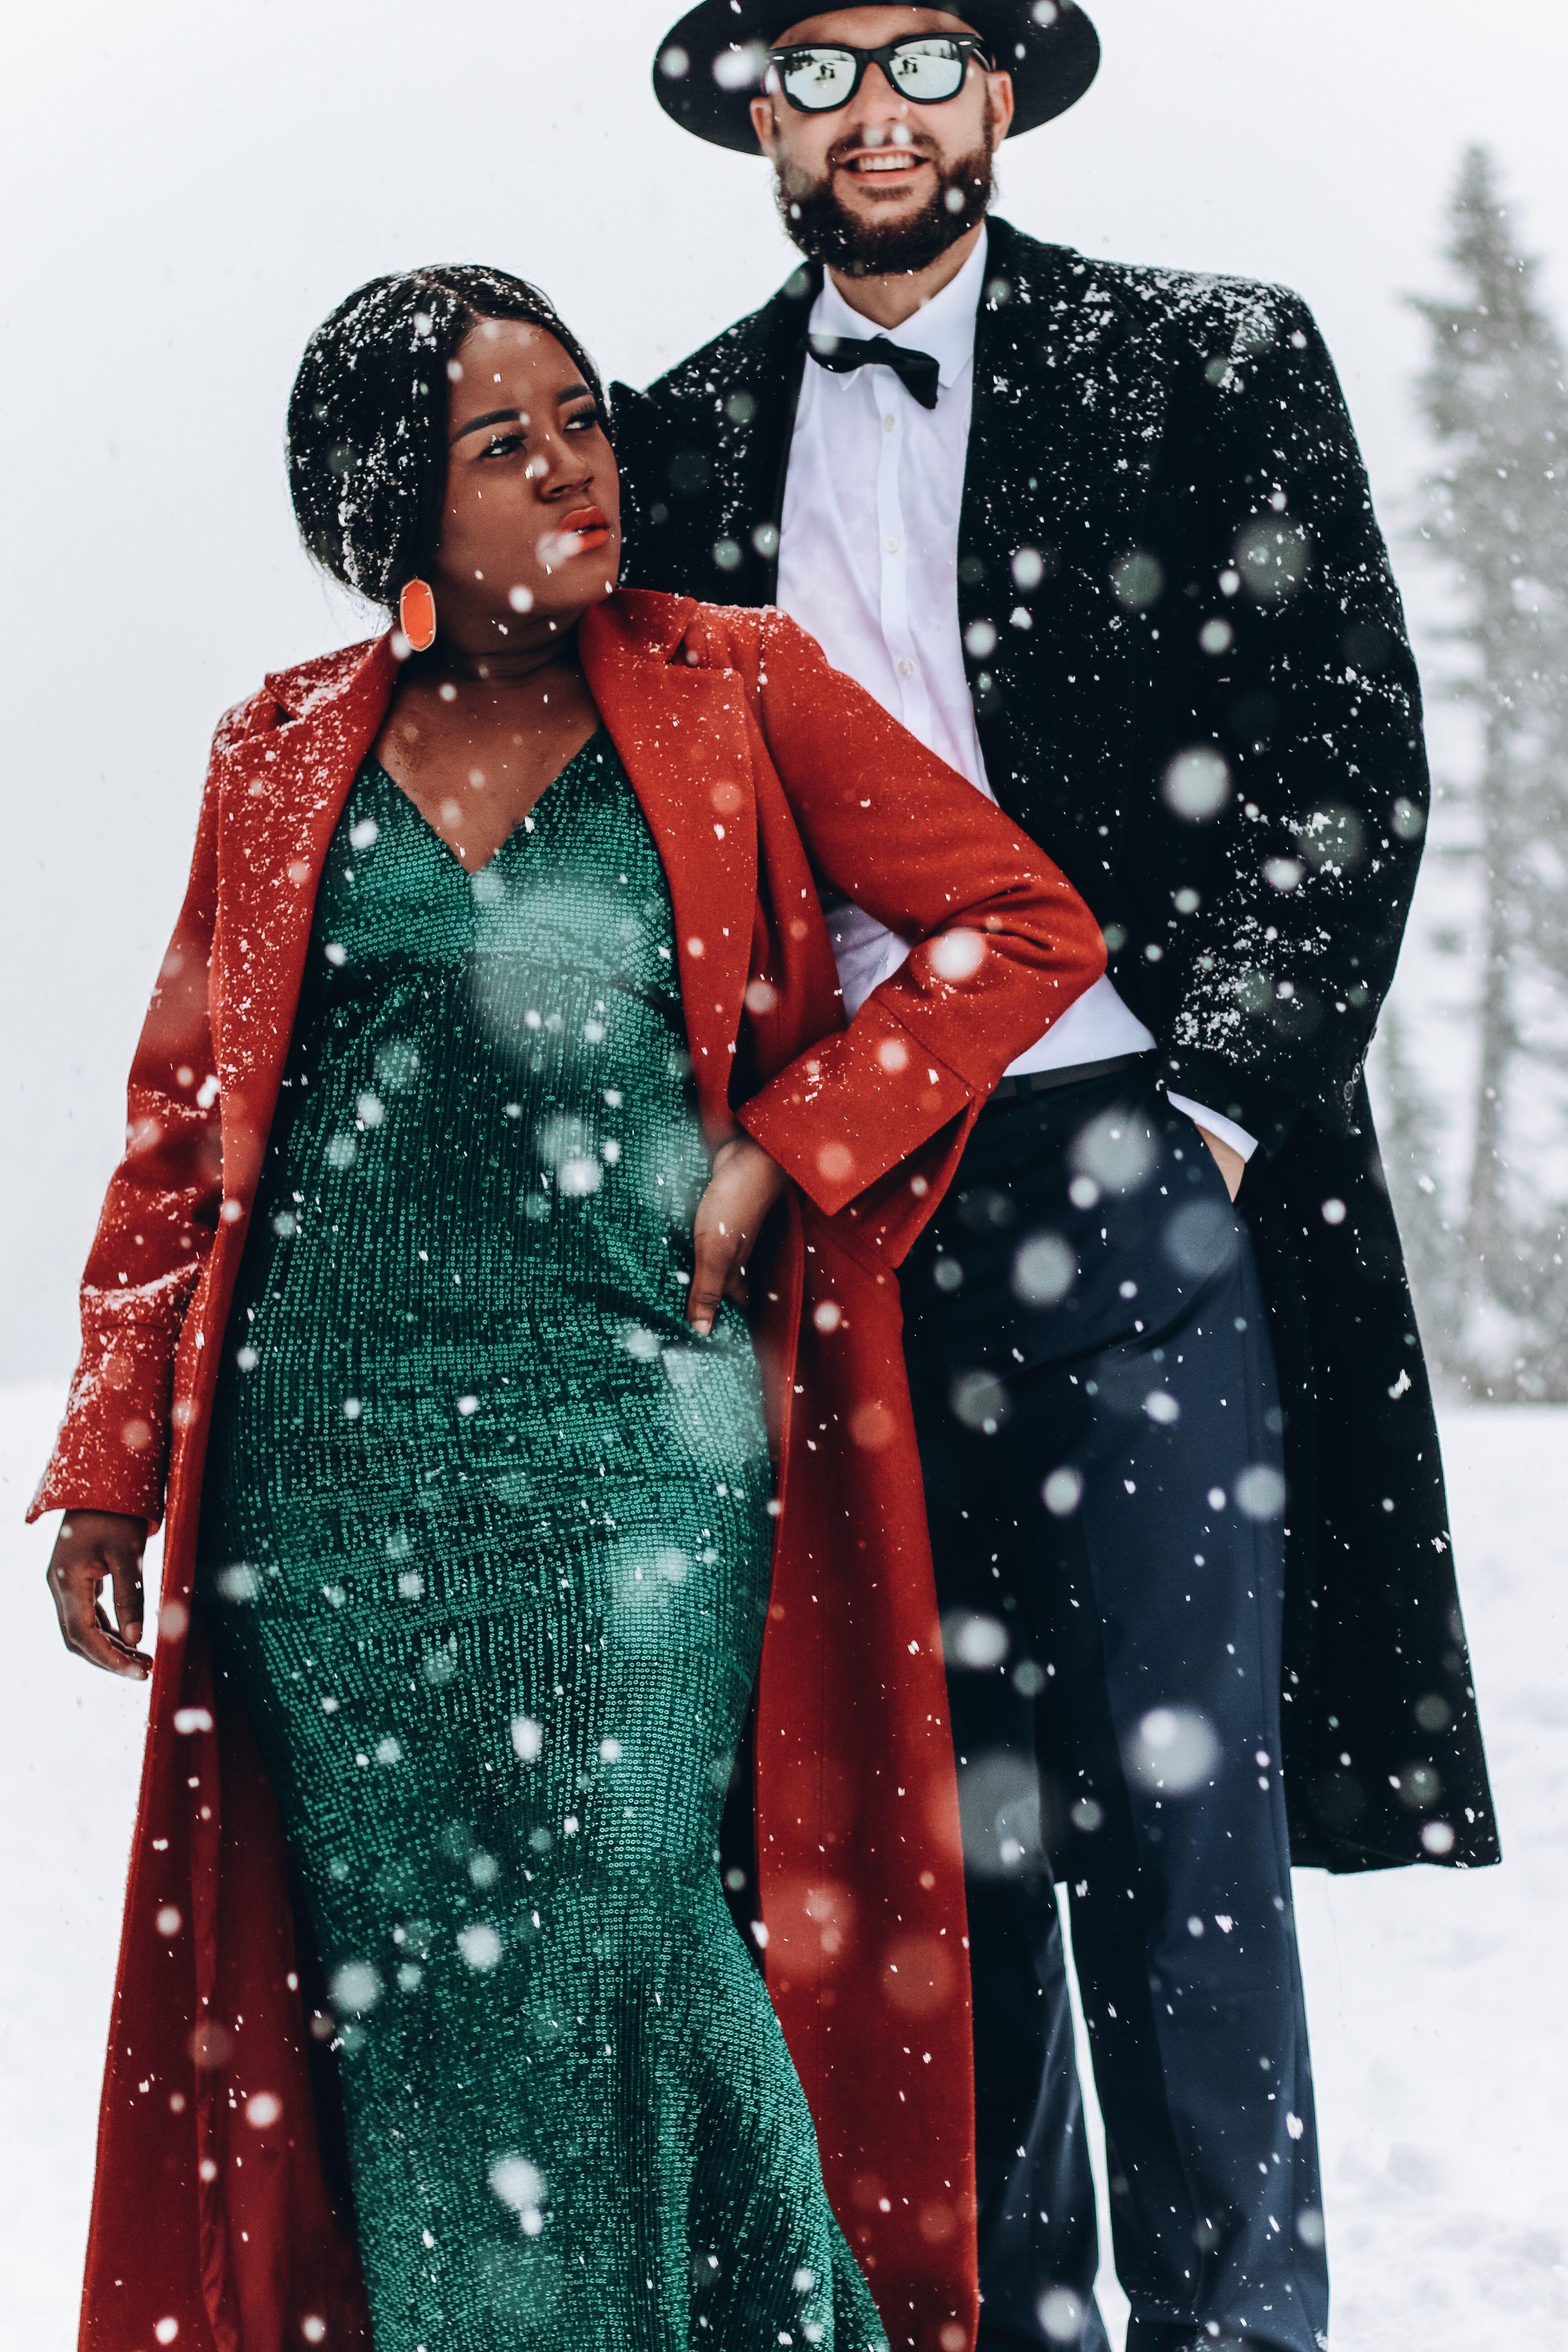 The Hoyles 2018 - FRISCLOSET -   17 christmas photoshoot couples black ideas